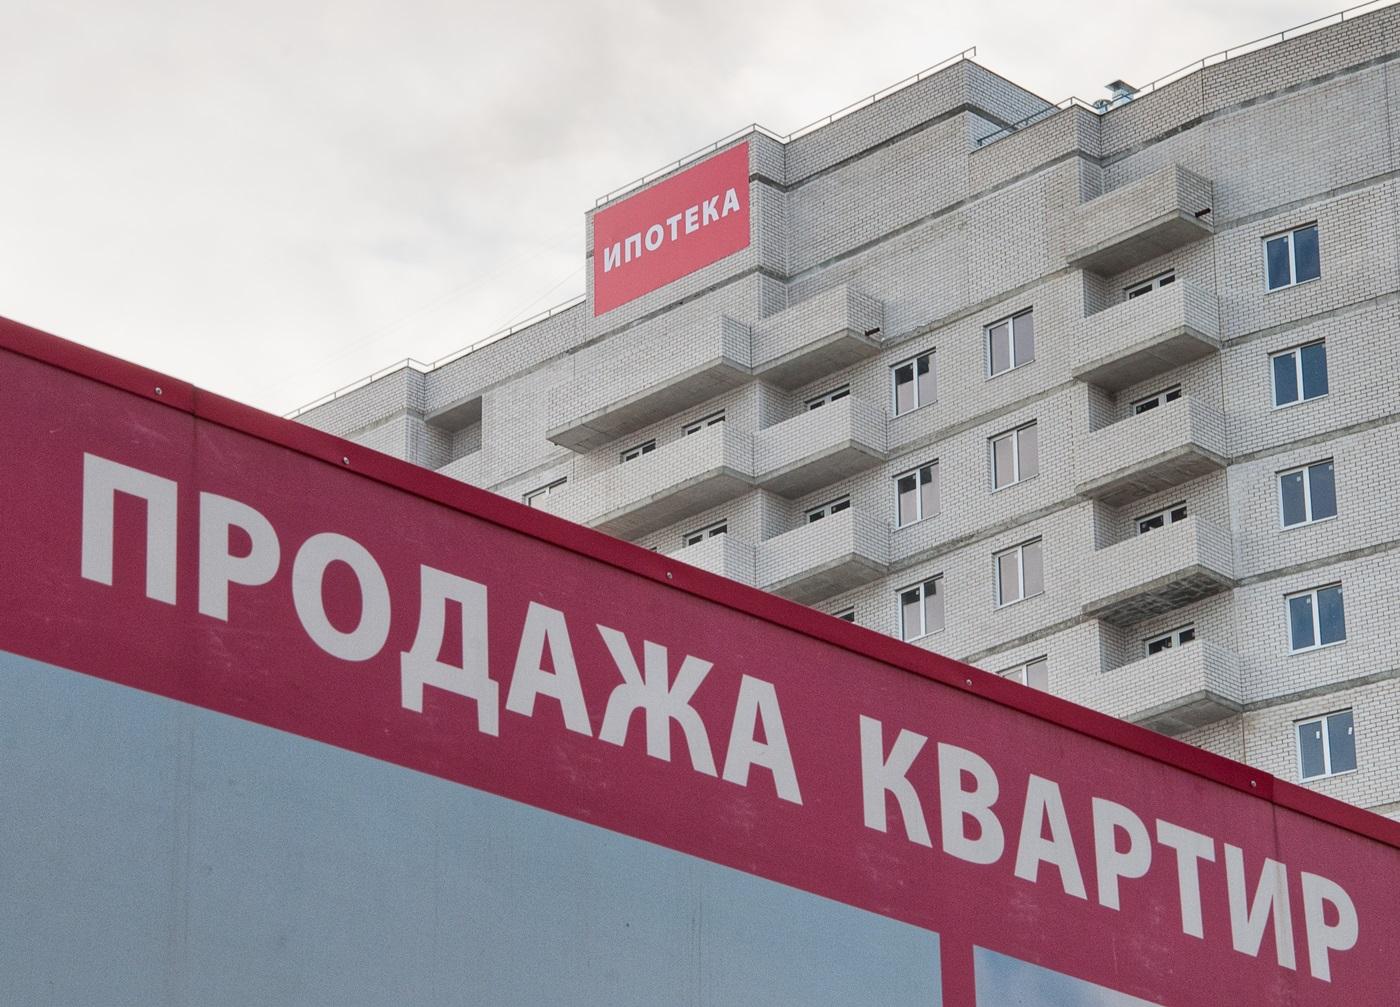 автор фотоОлег Харсеев/Коммерсантъ